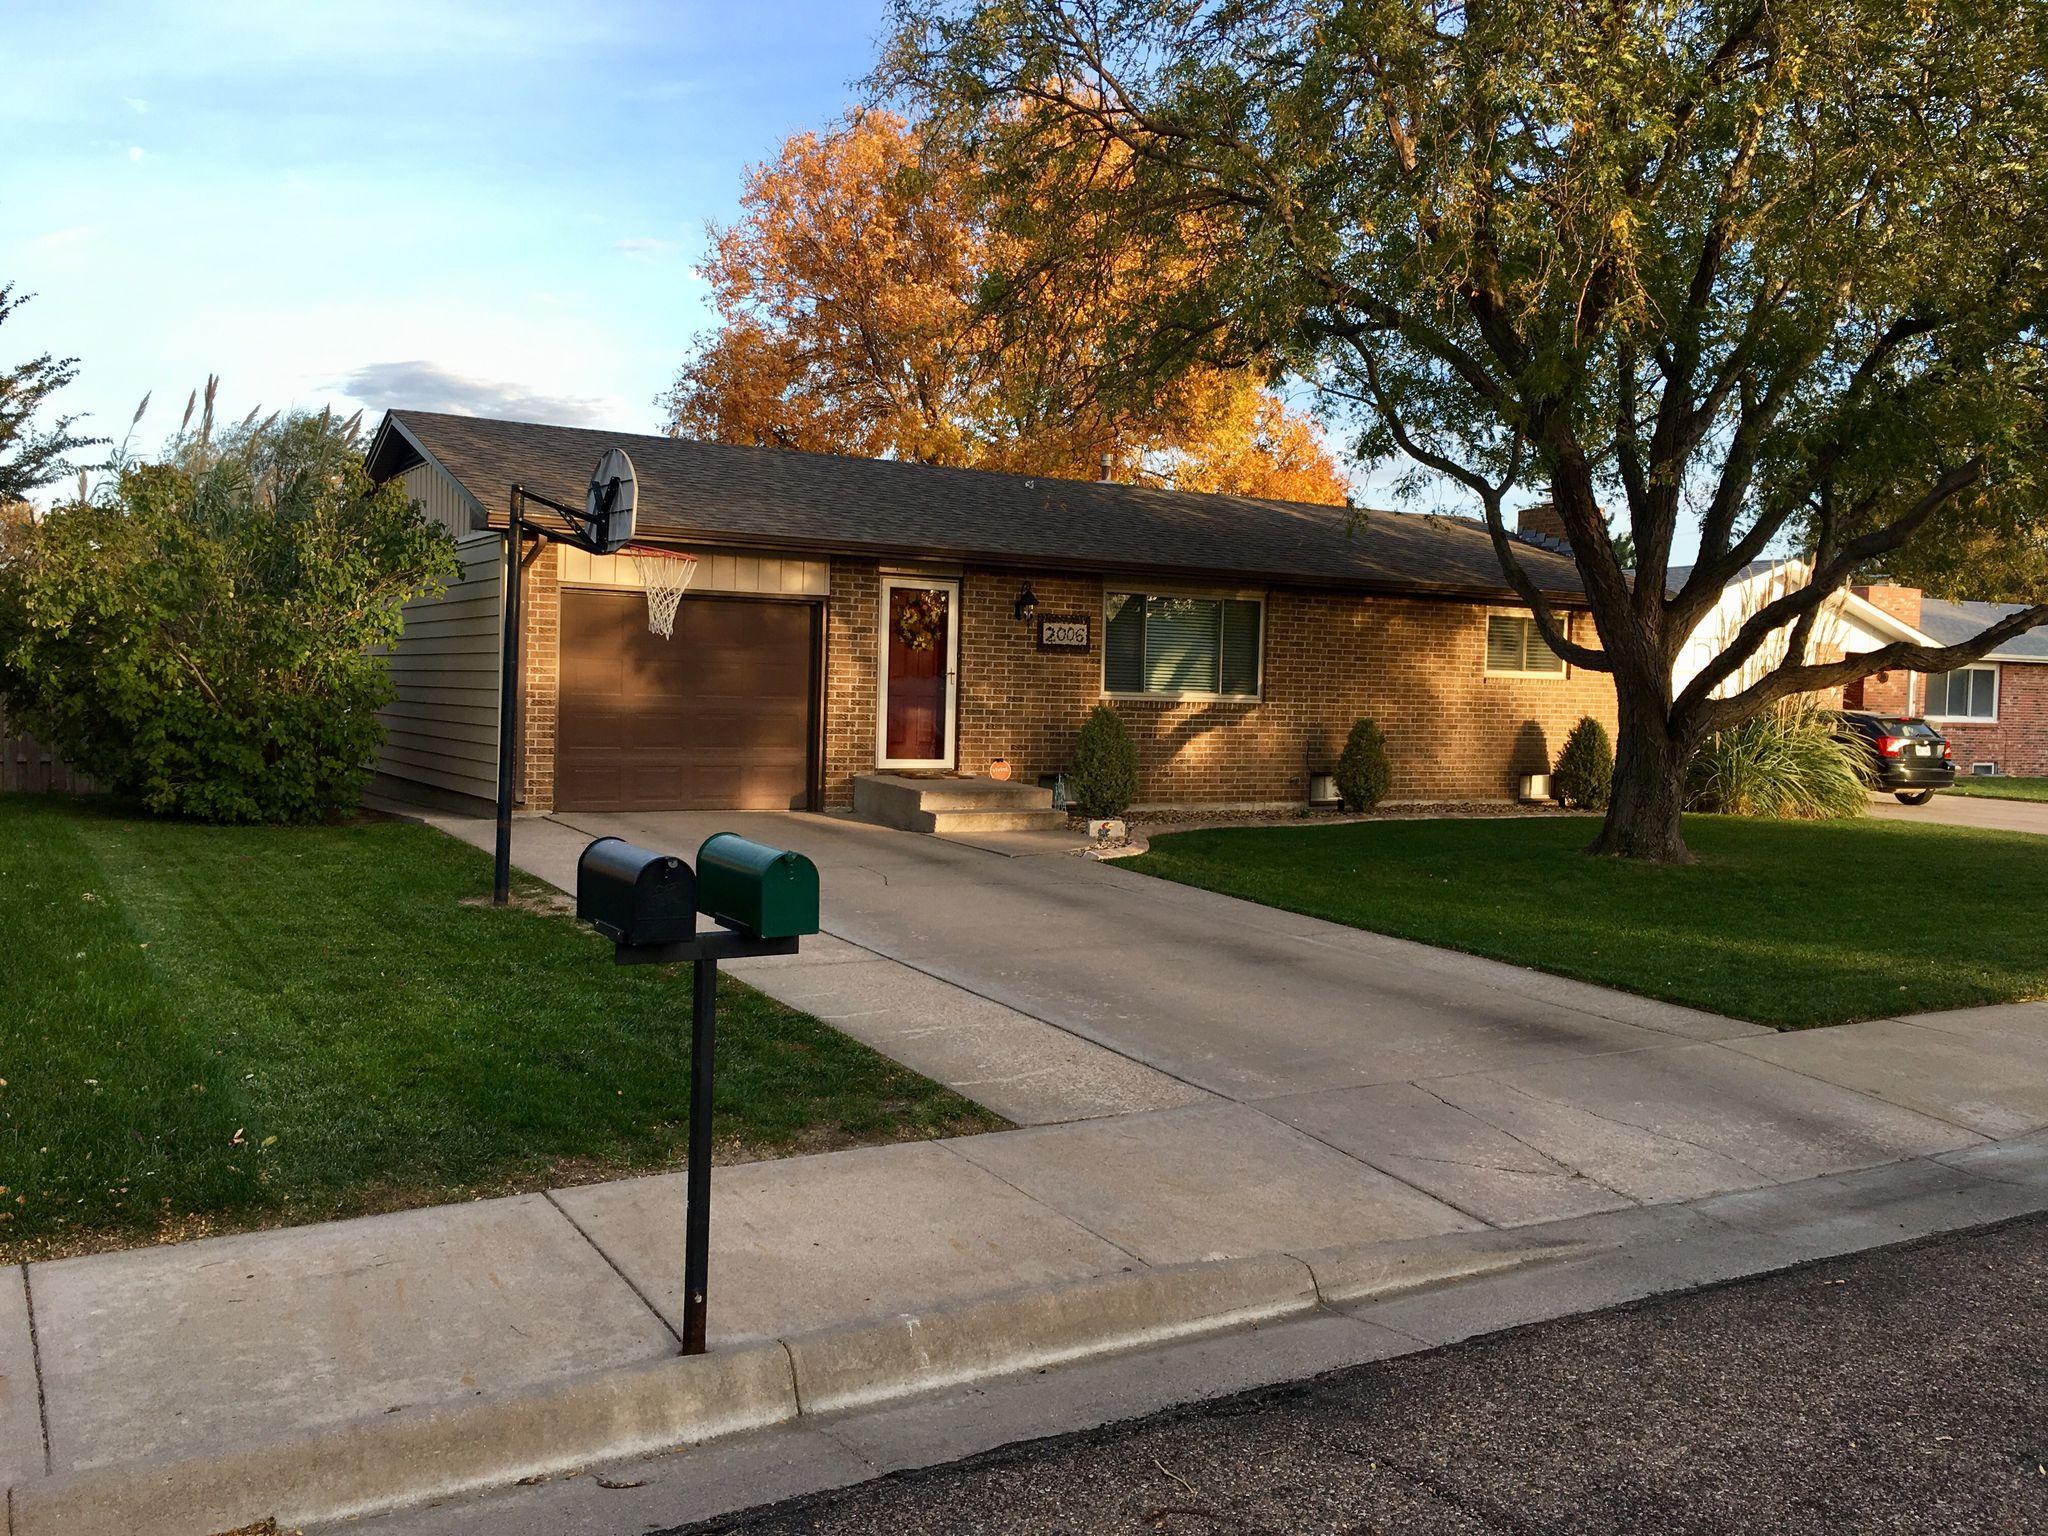 2006 N Arapahoe Dr, Garden City, KS 67846 - Estimate and Home ...